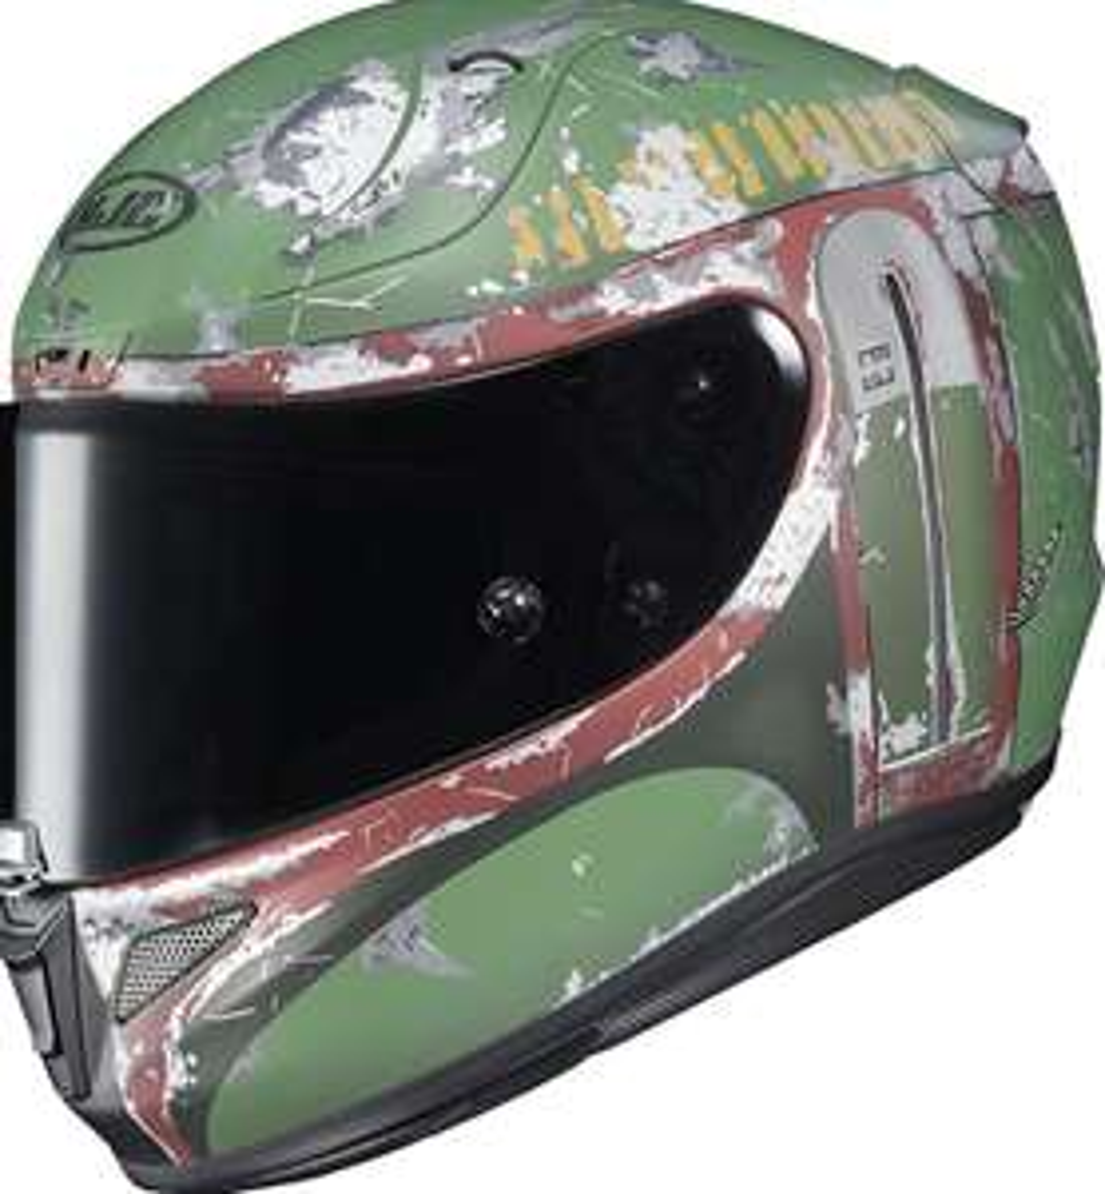 HJC RPHA-11 - Boba Fett motorcycle helmet £274.99 @ helmet city